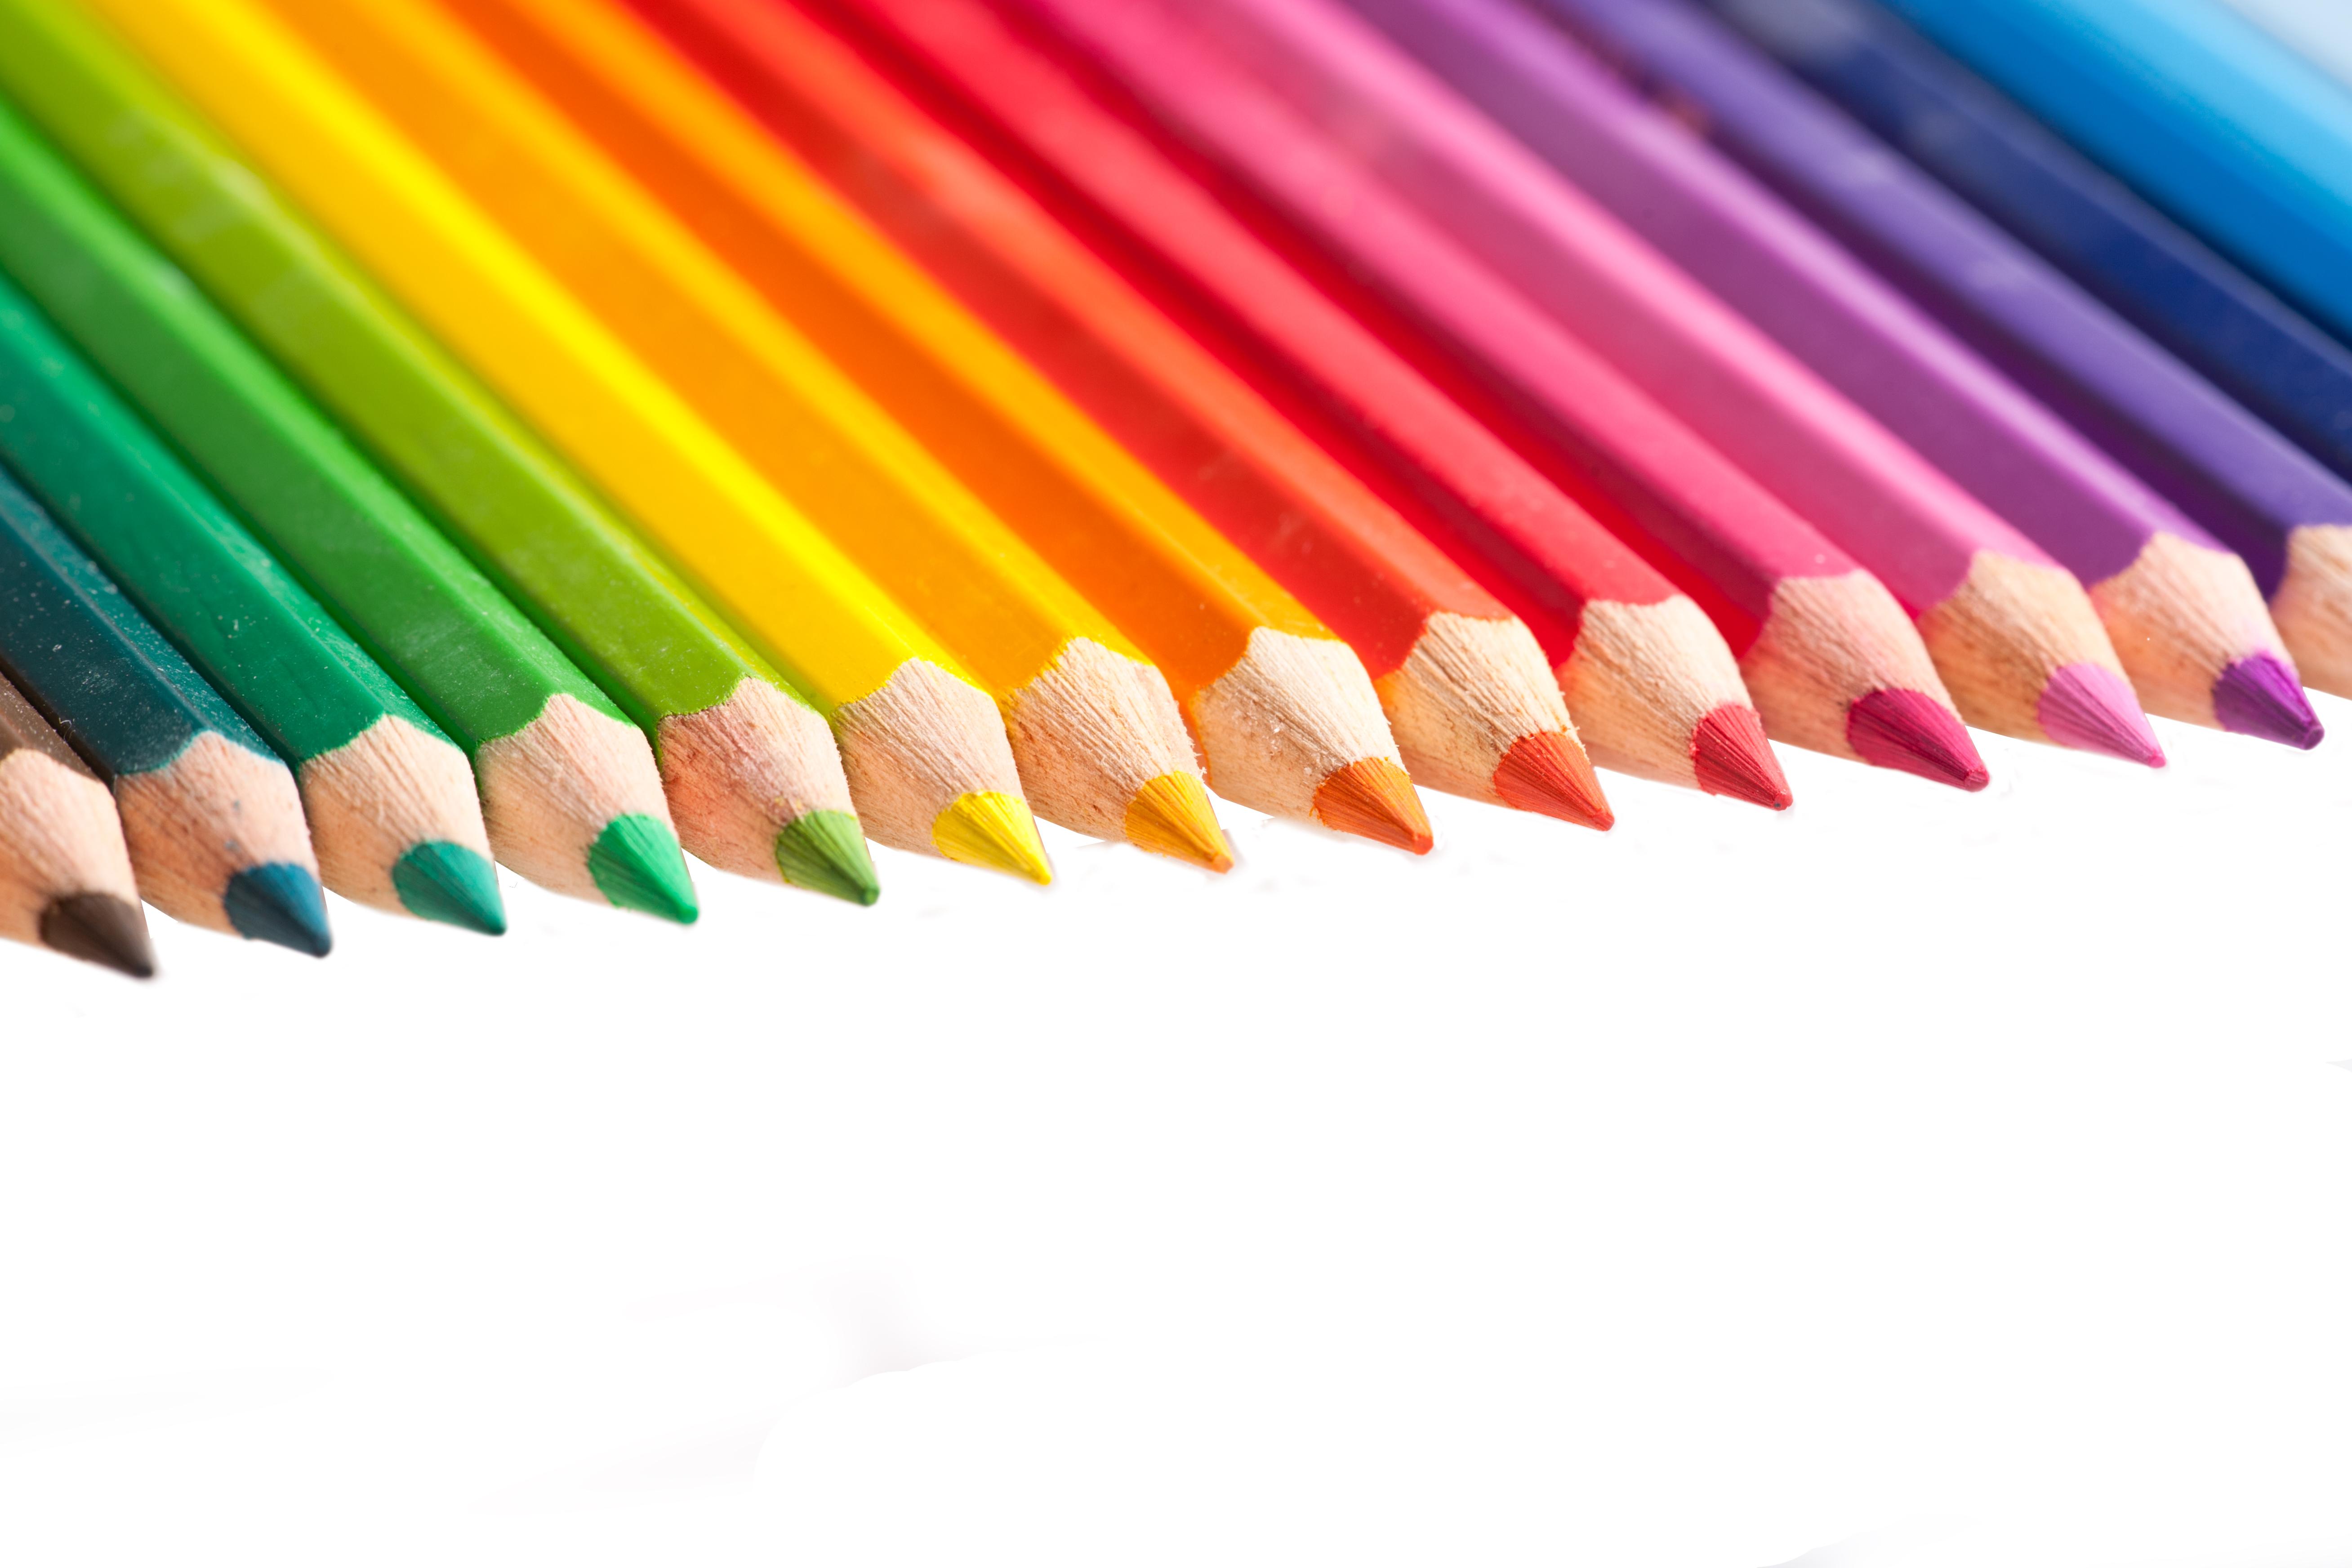 Color pencils, Art, Isolated, Multi, Nobody, HQ Photo